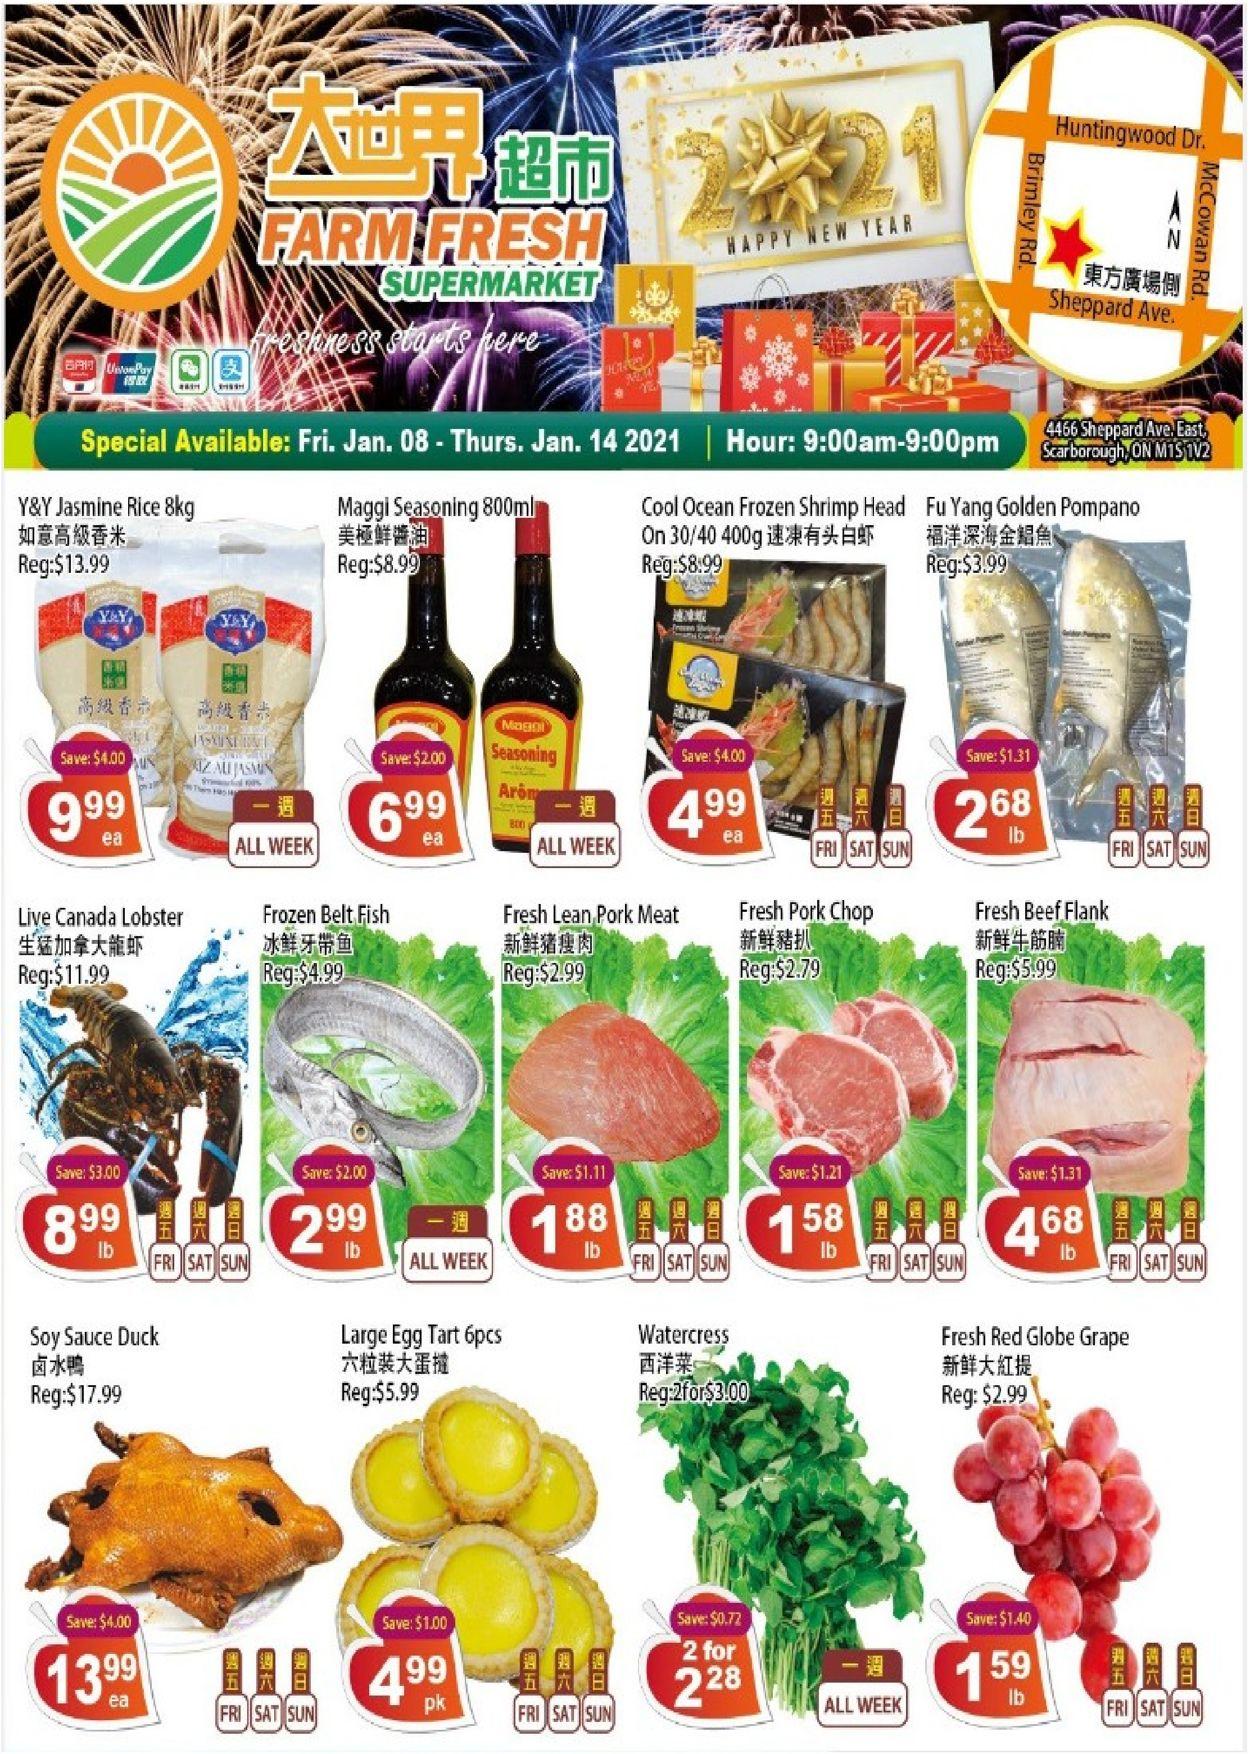 Farm Fresh Weekly Ad Circular - valid 01/13-01/14/2021